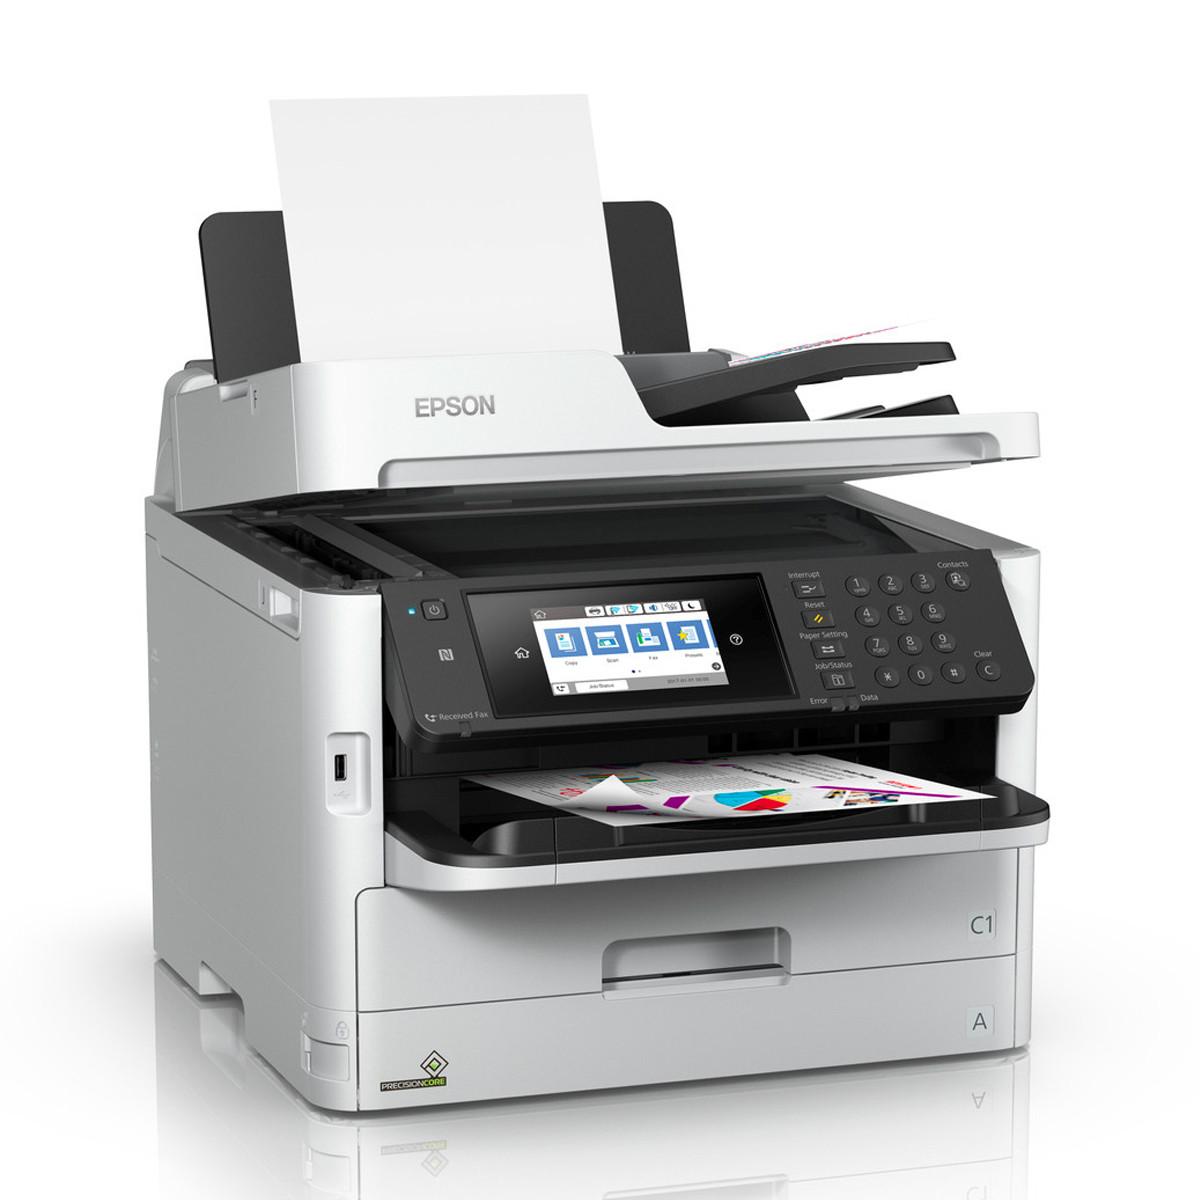 Impressora Epson WorkForce Pro WF-C5790 C5790   Multifuncional com Bolsa de Tinta Colorida Wireless